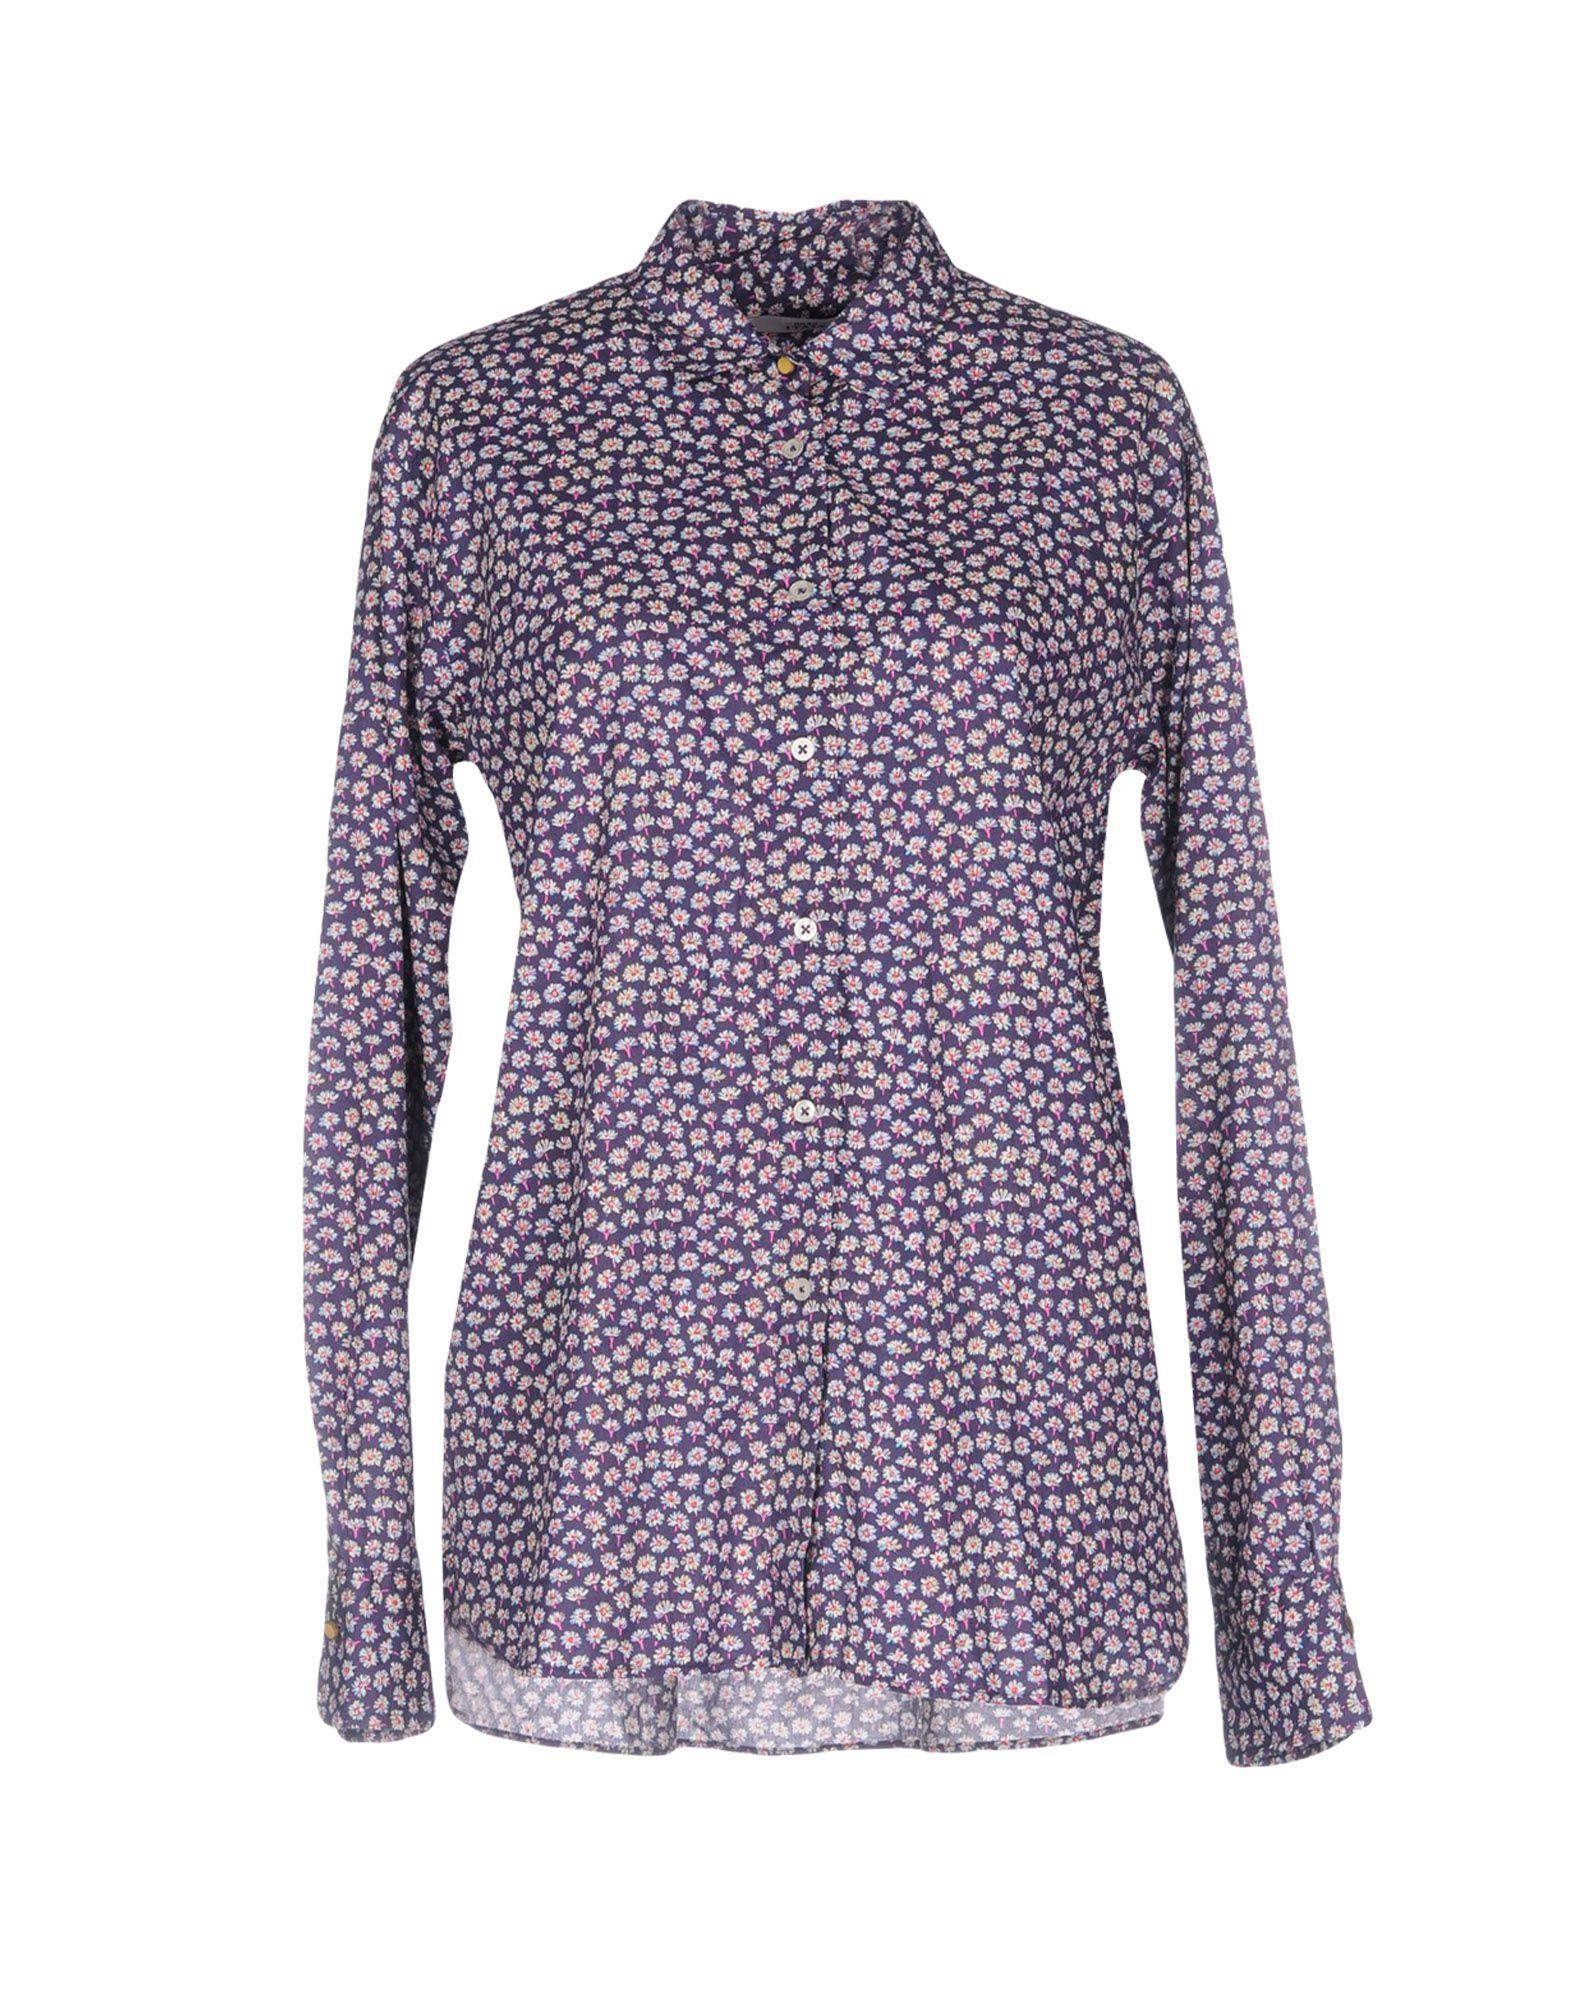 0039 ITALY Pубашка 0039 italy свитер